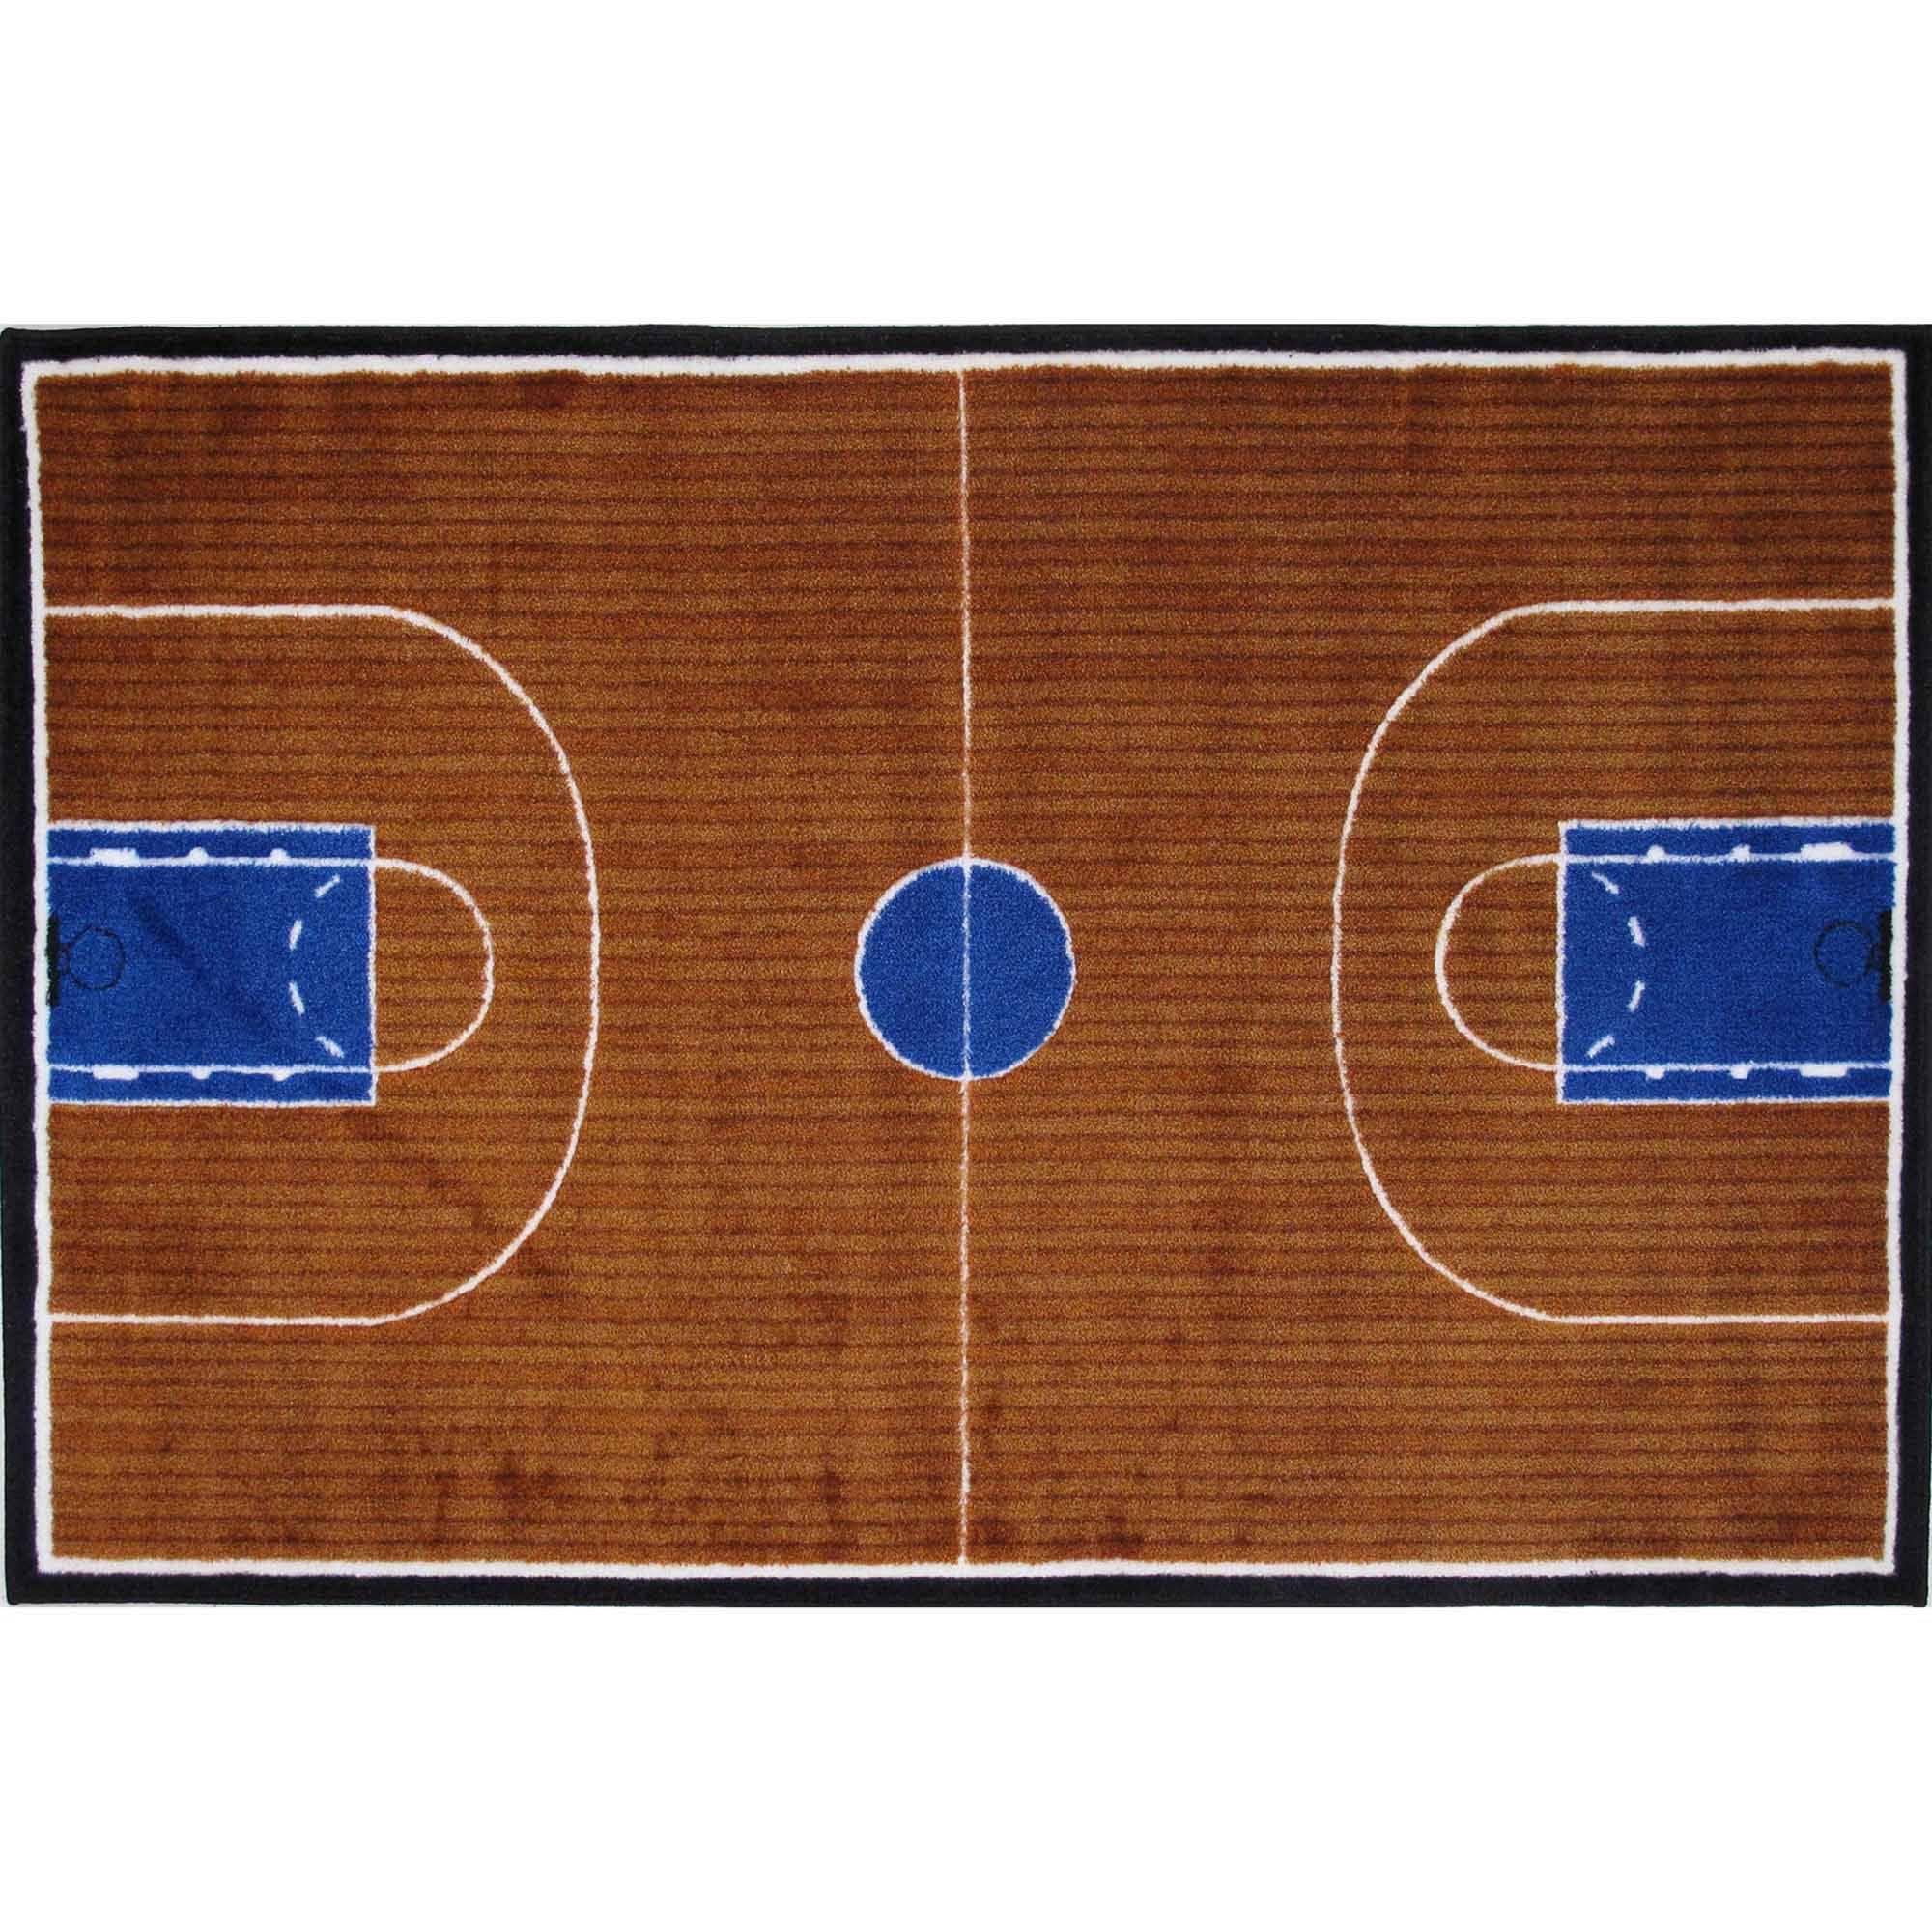 Fun Rugs Basketball Court Kids Rugs